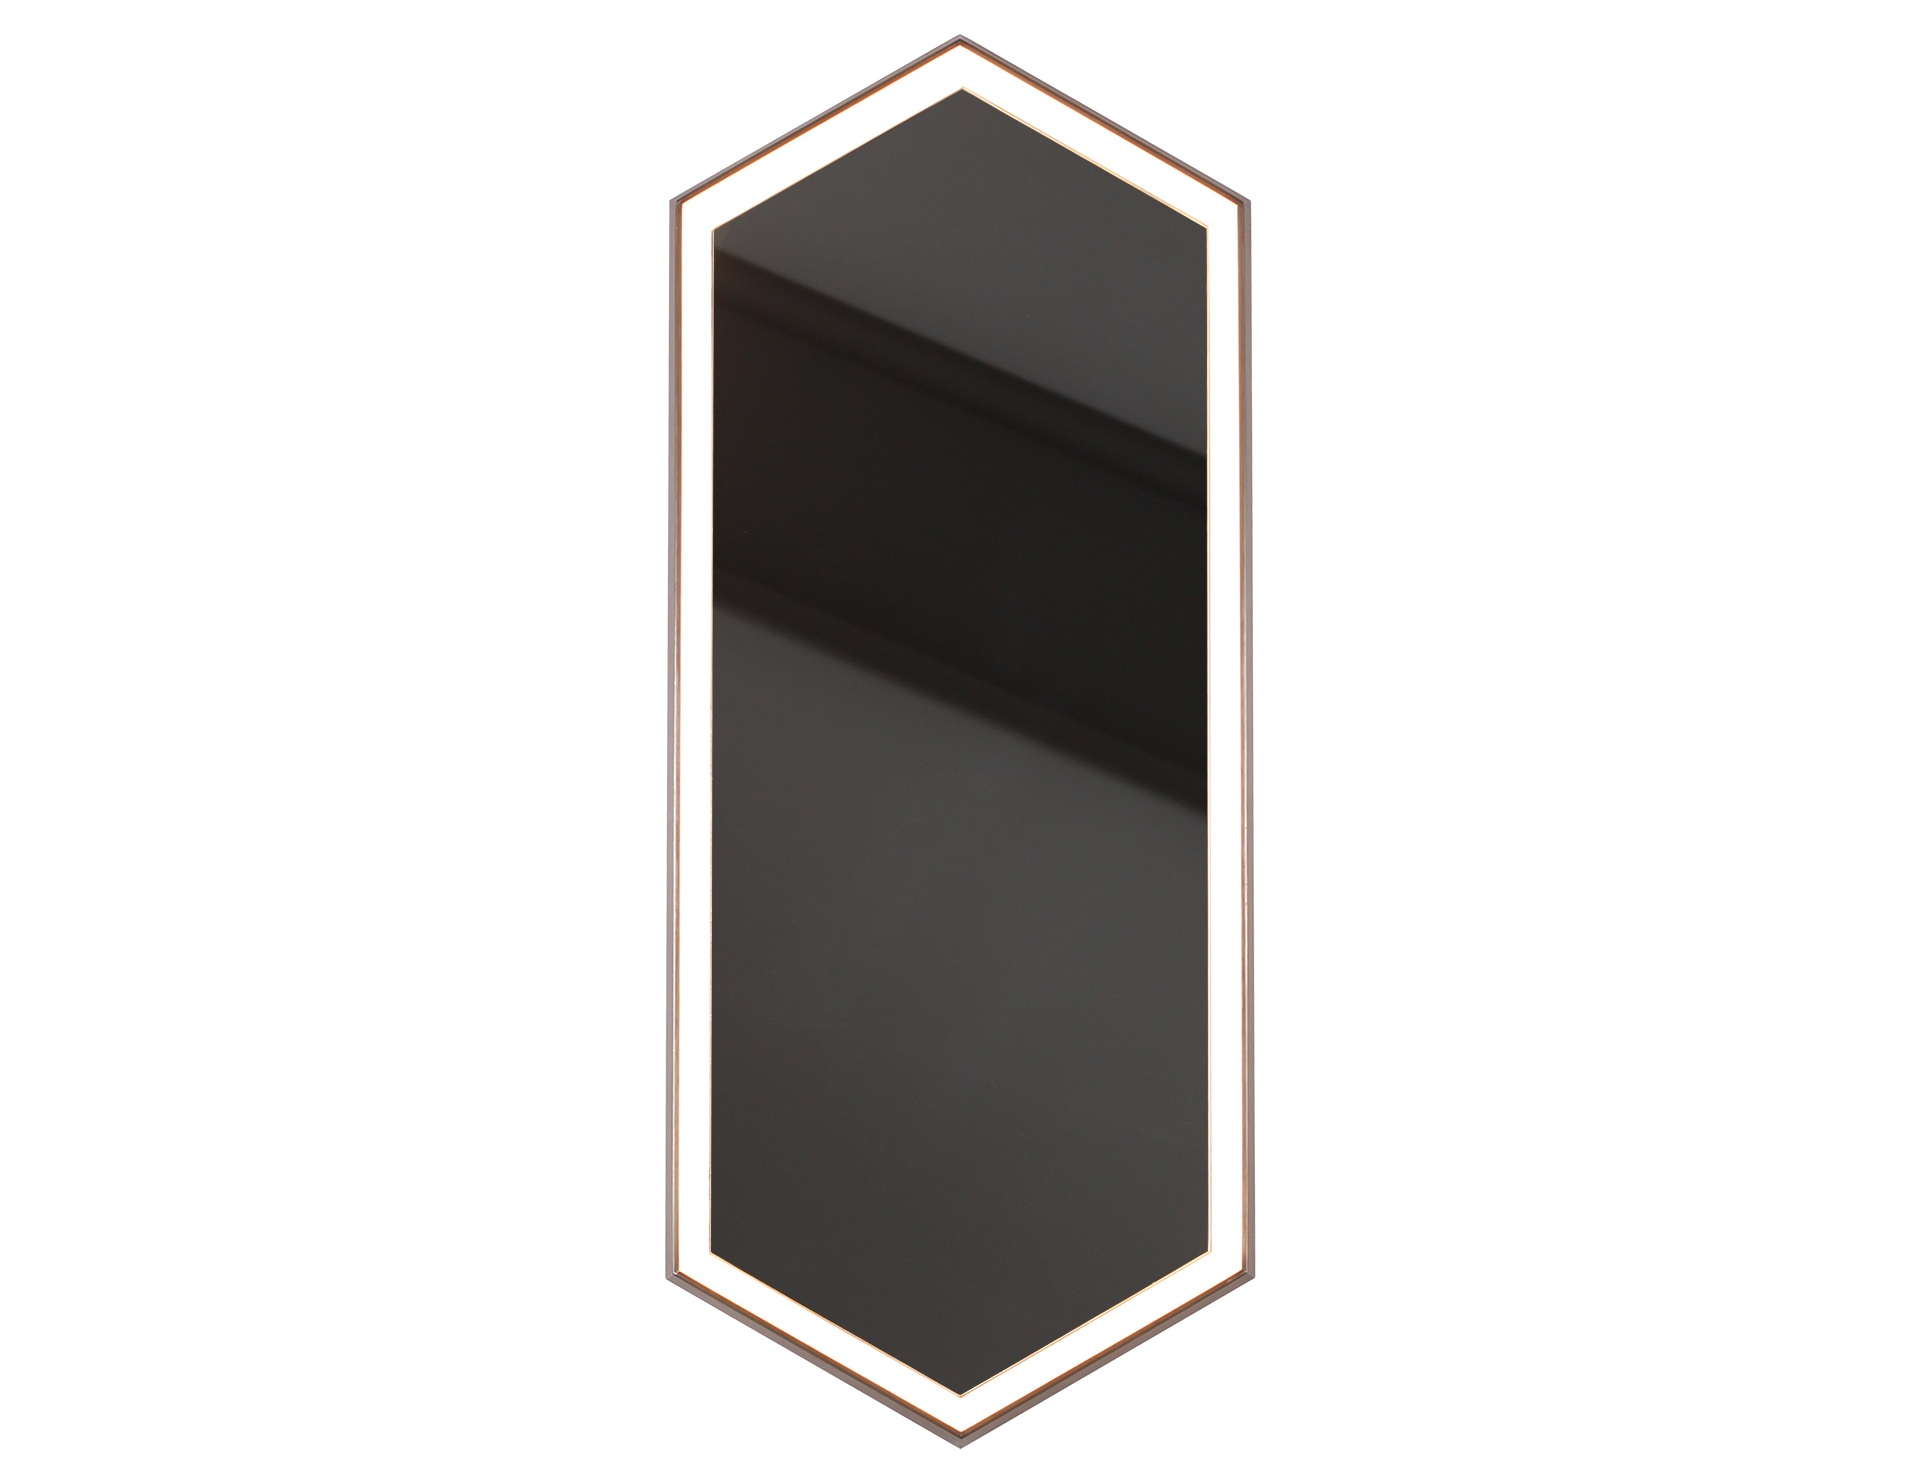 Mirror_StraightOn_SM.jpg